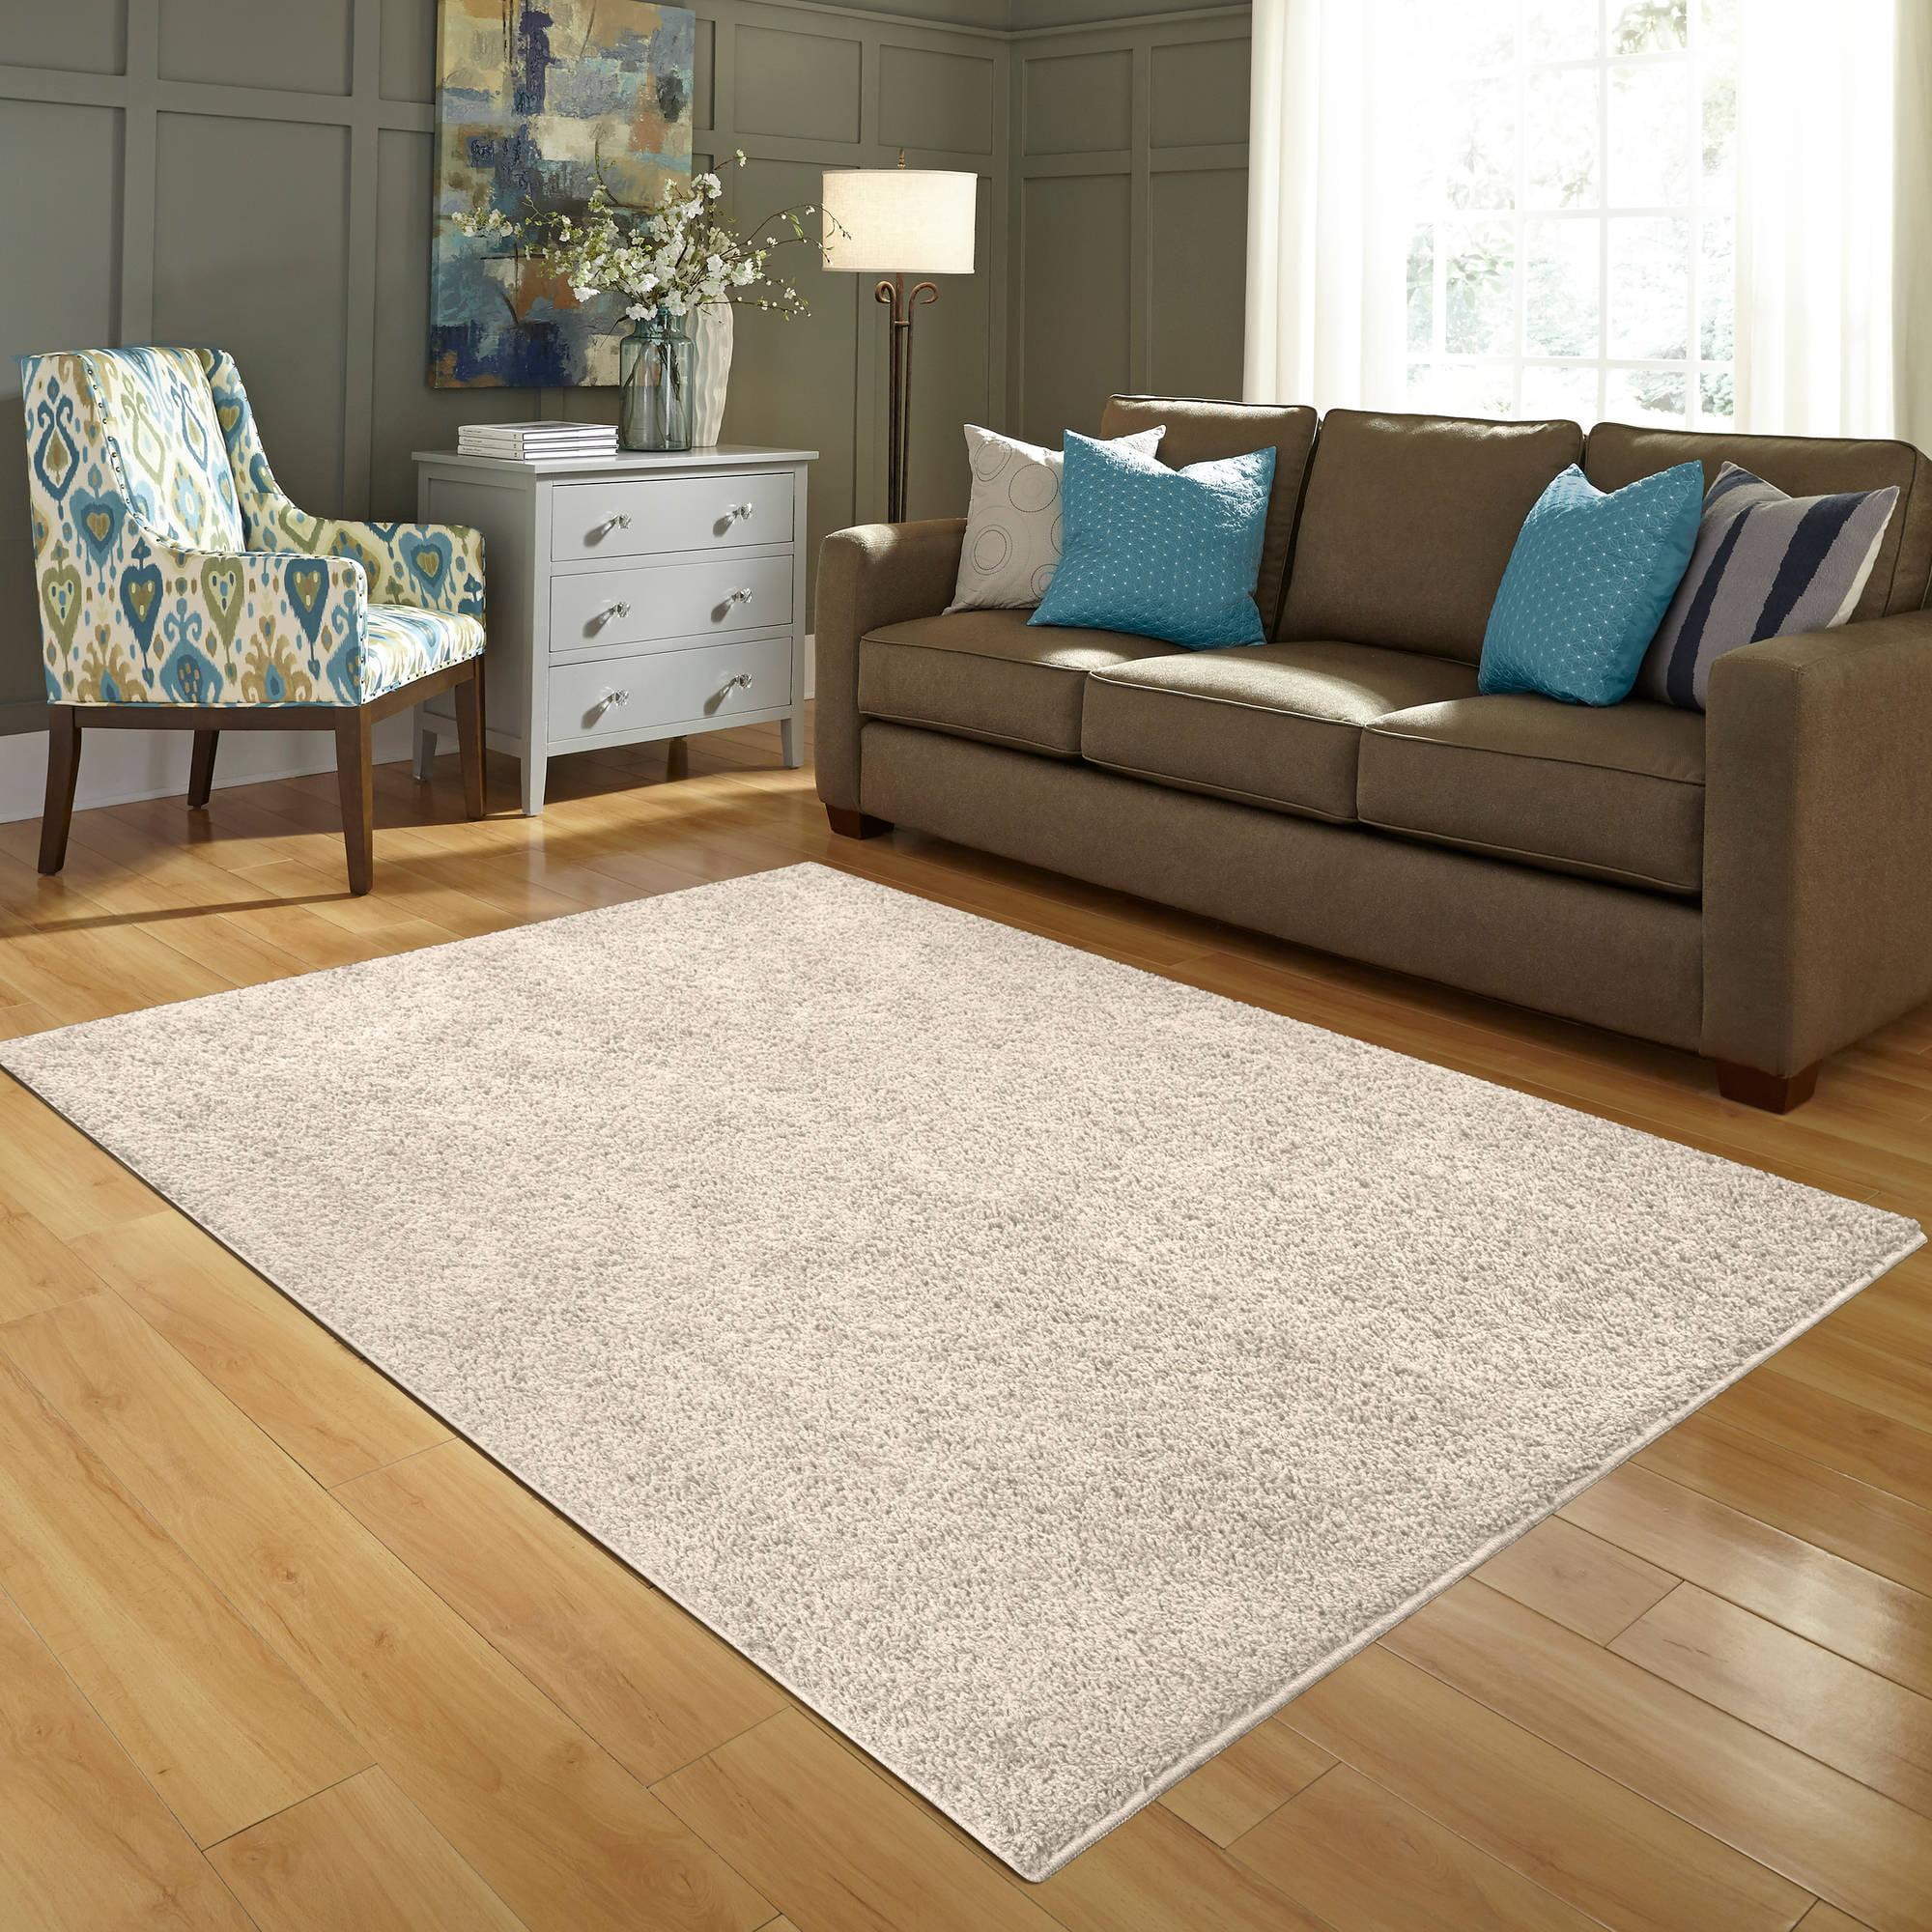 Shag Area Rugs mainstays olefin shag area rug collection - walmart